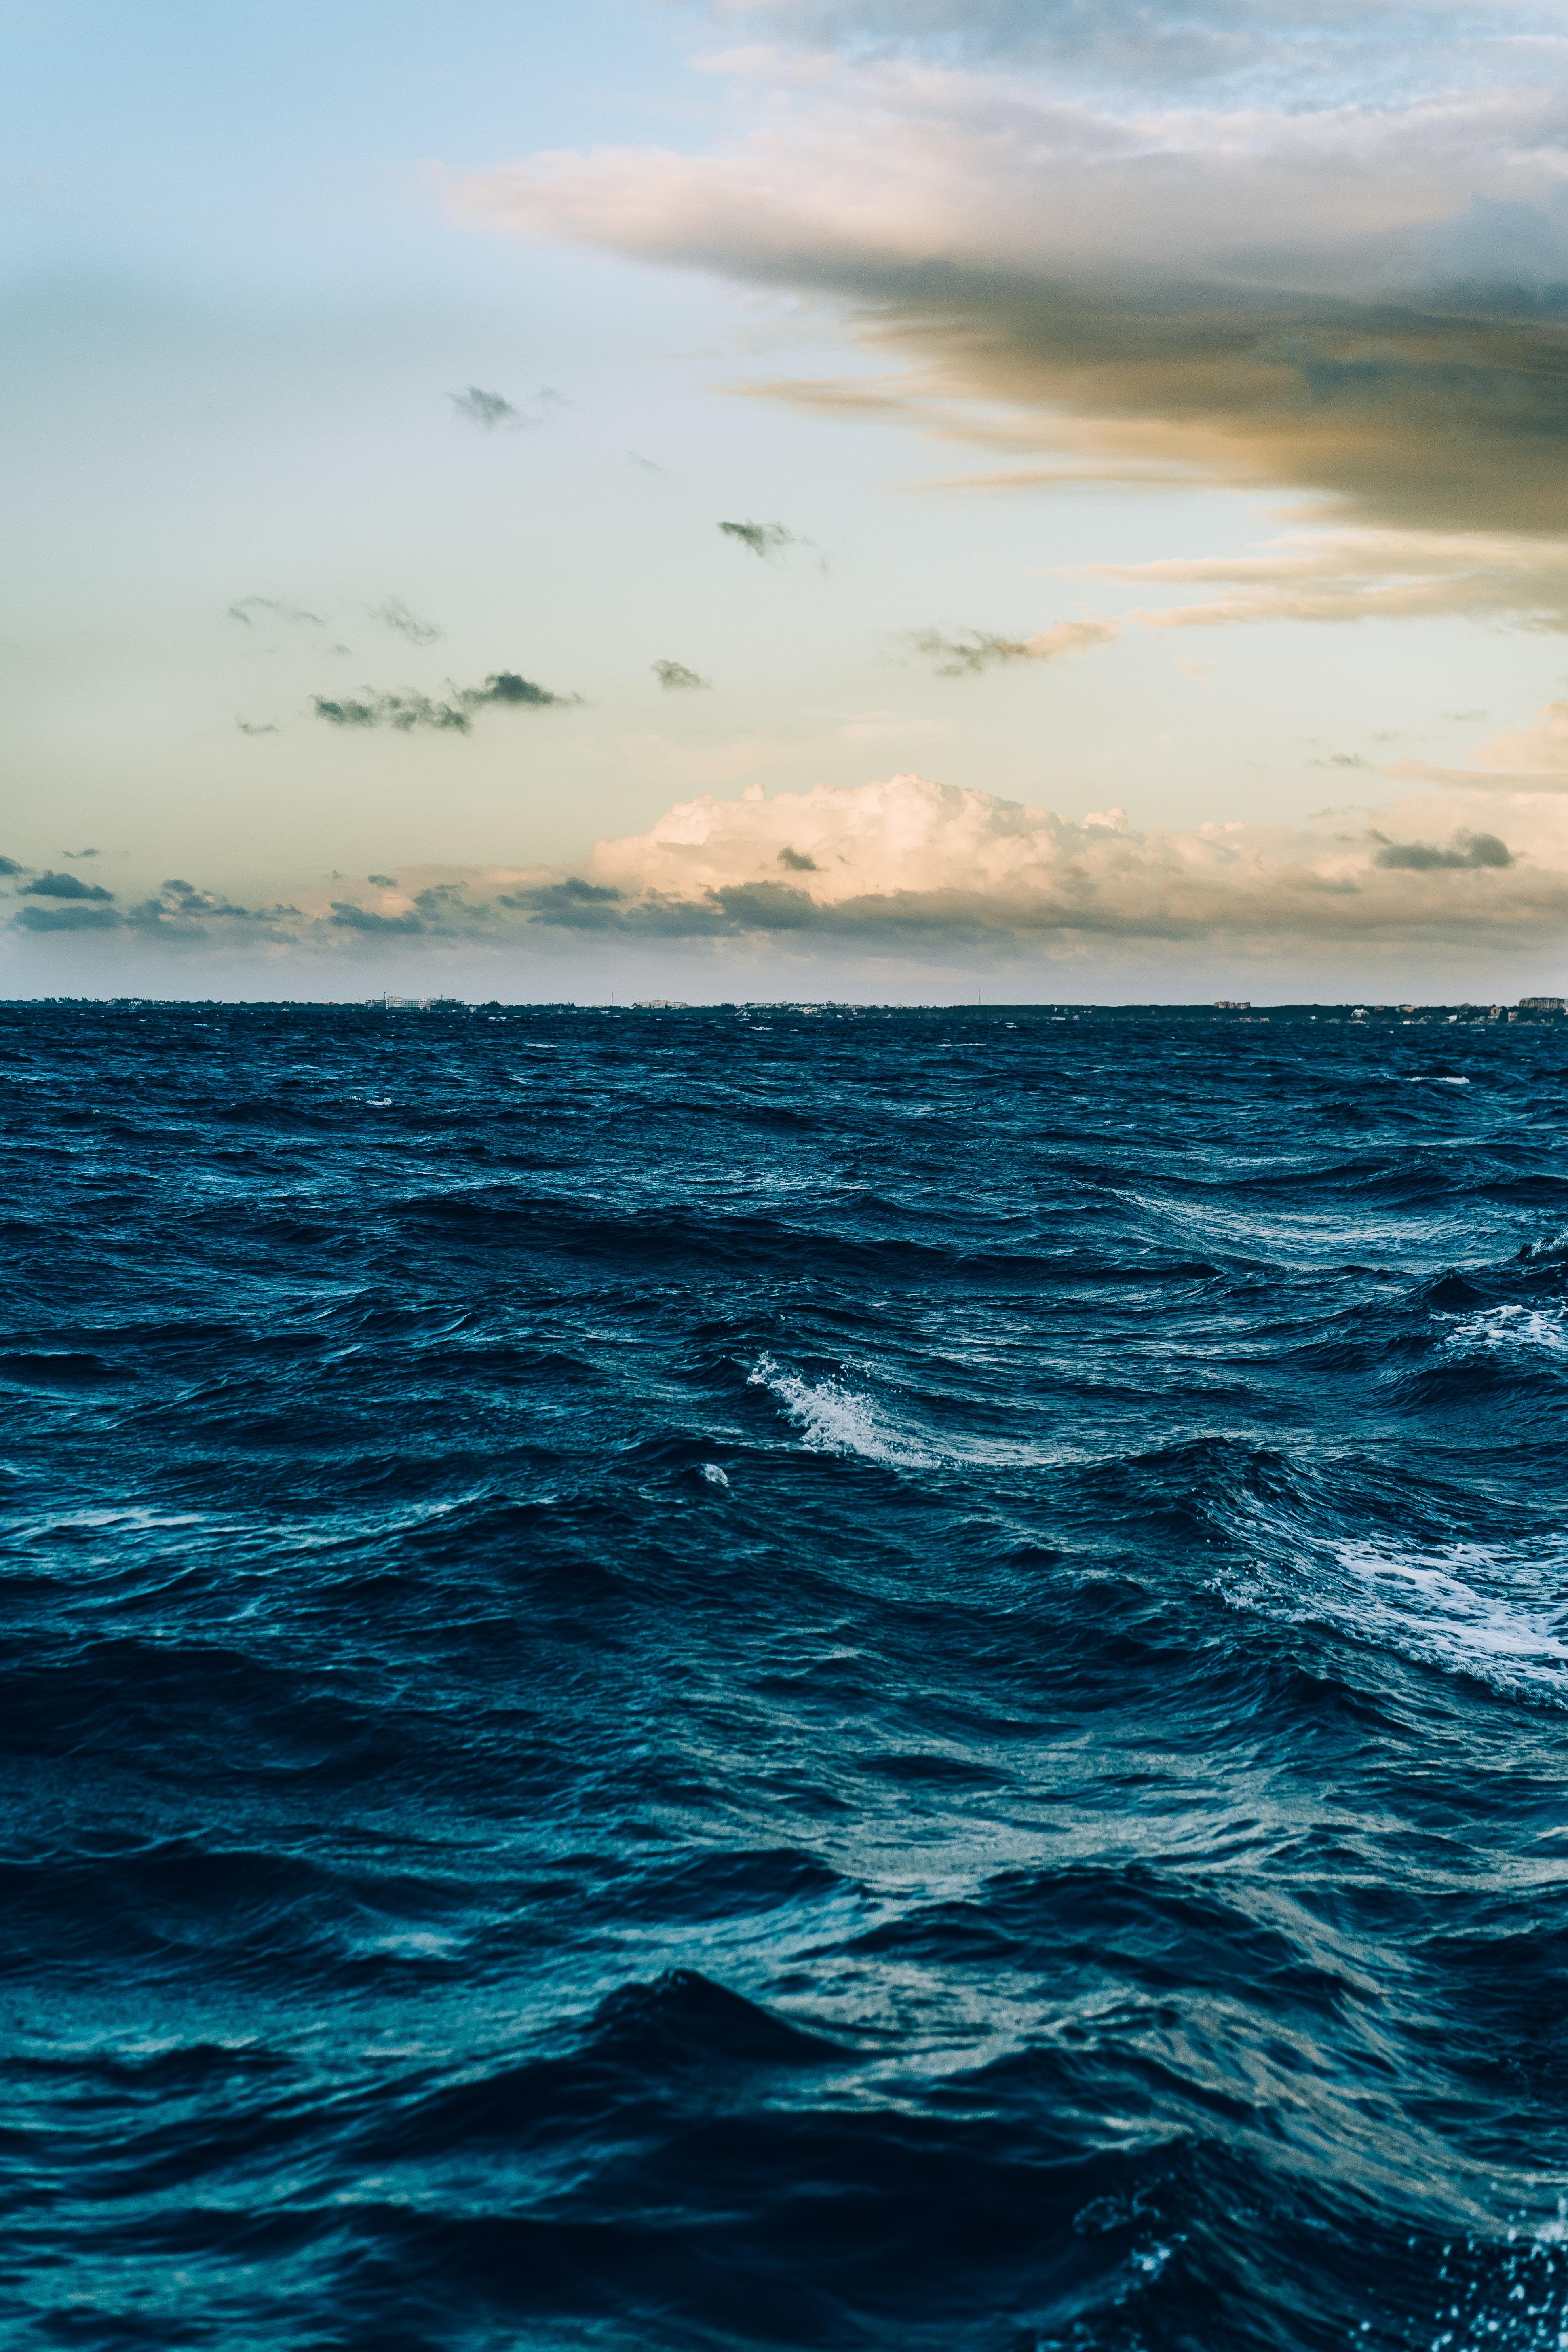 blue-ocean-h2o-nature-1802268